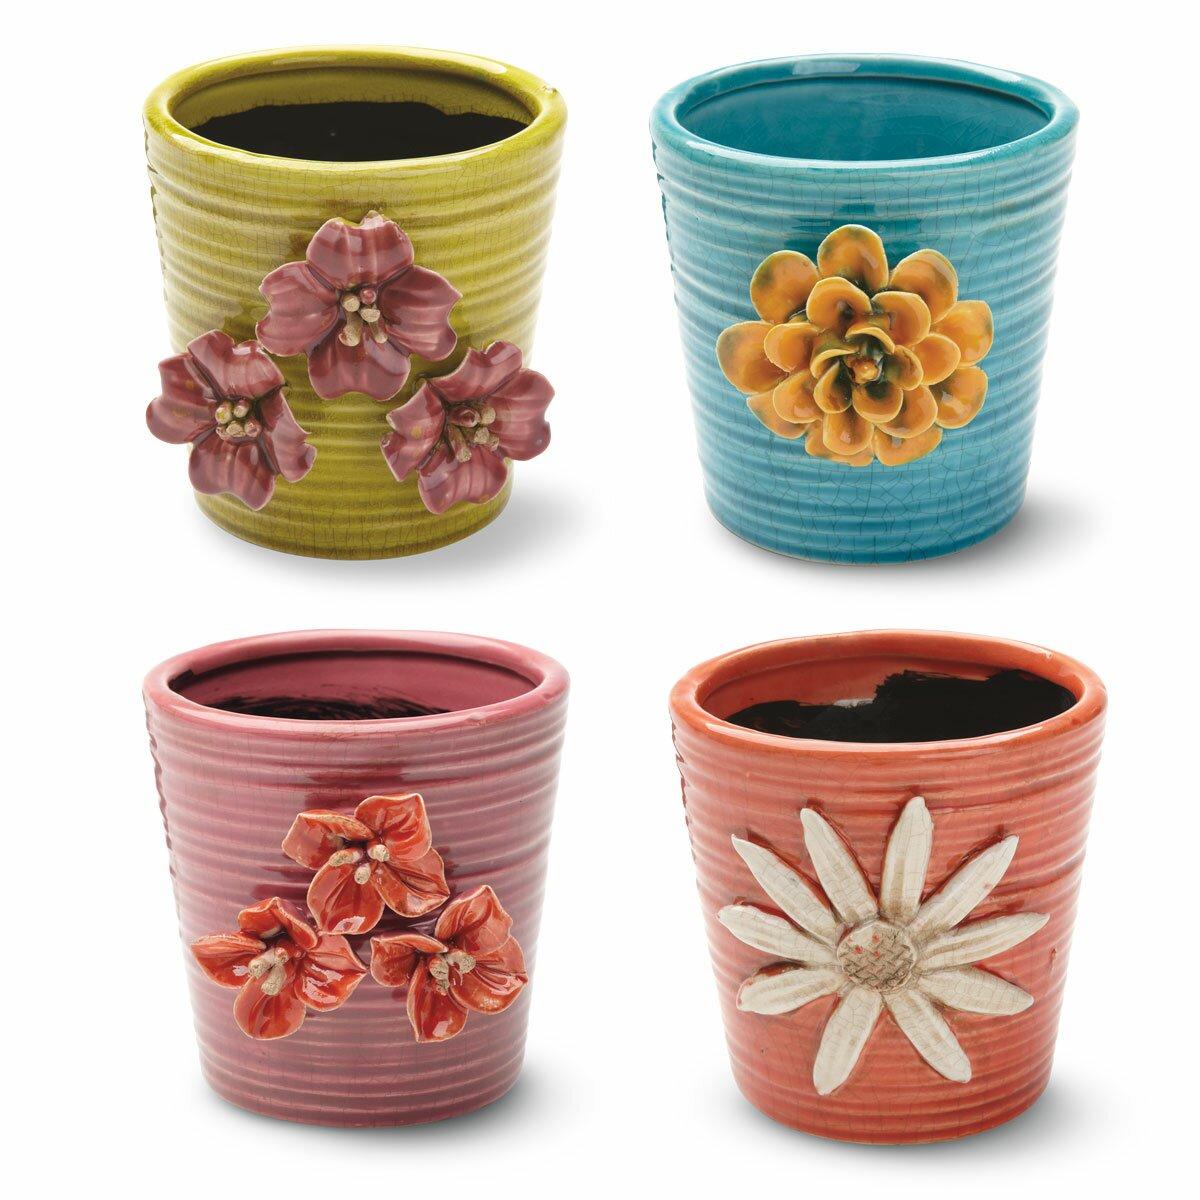 Foreside home garden boho round pot planter reviews for Flower pots design images